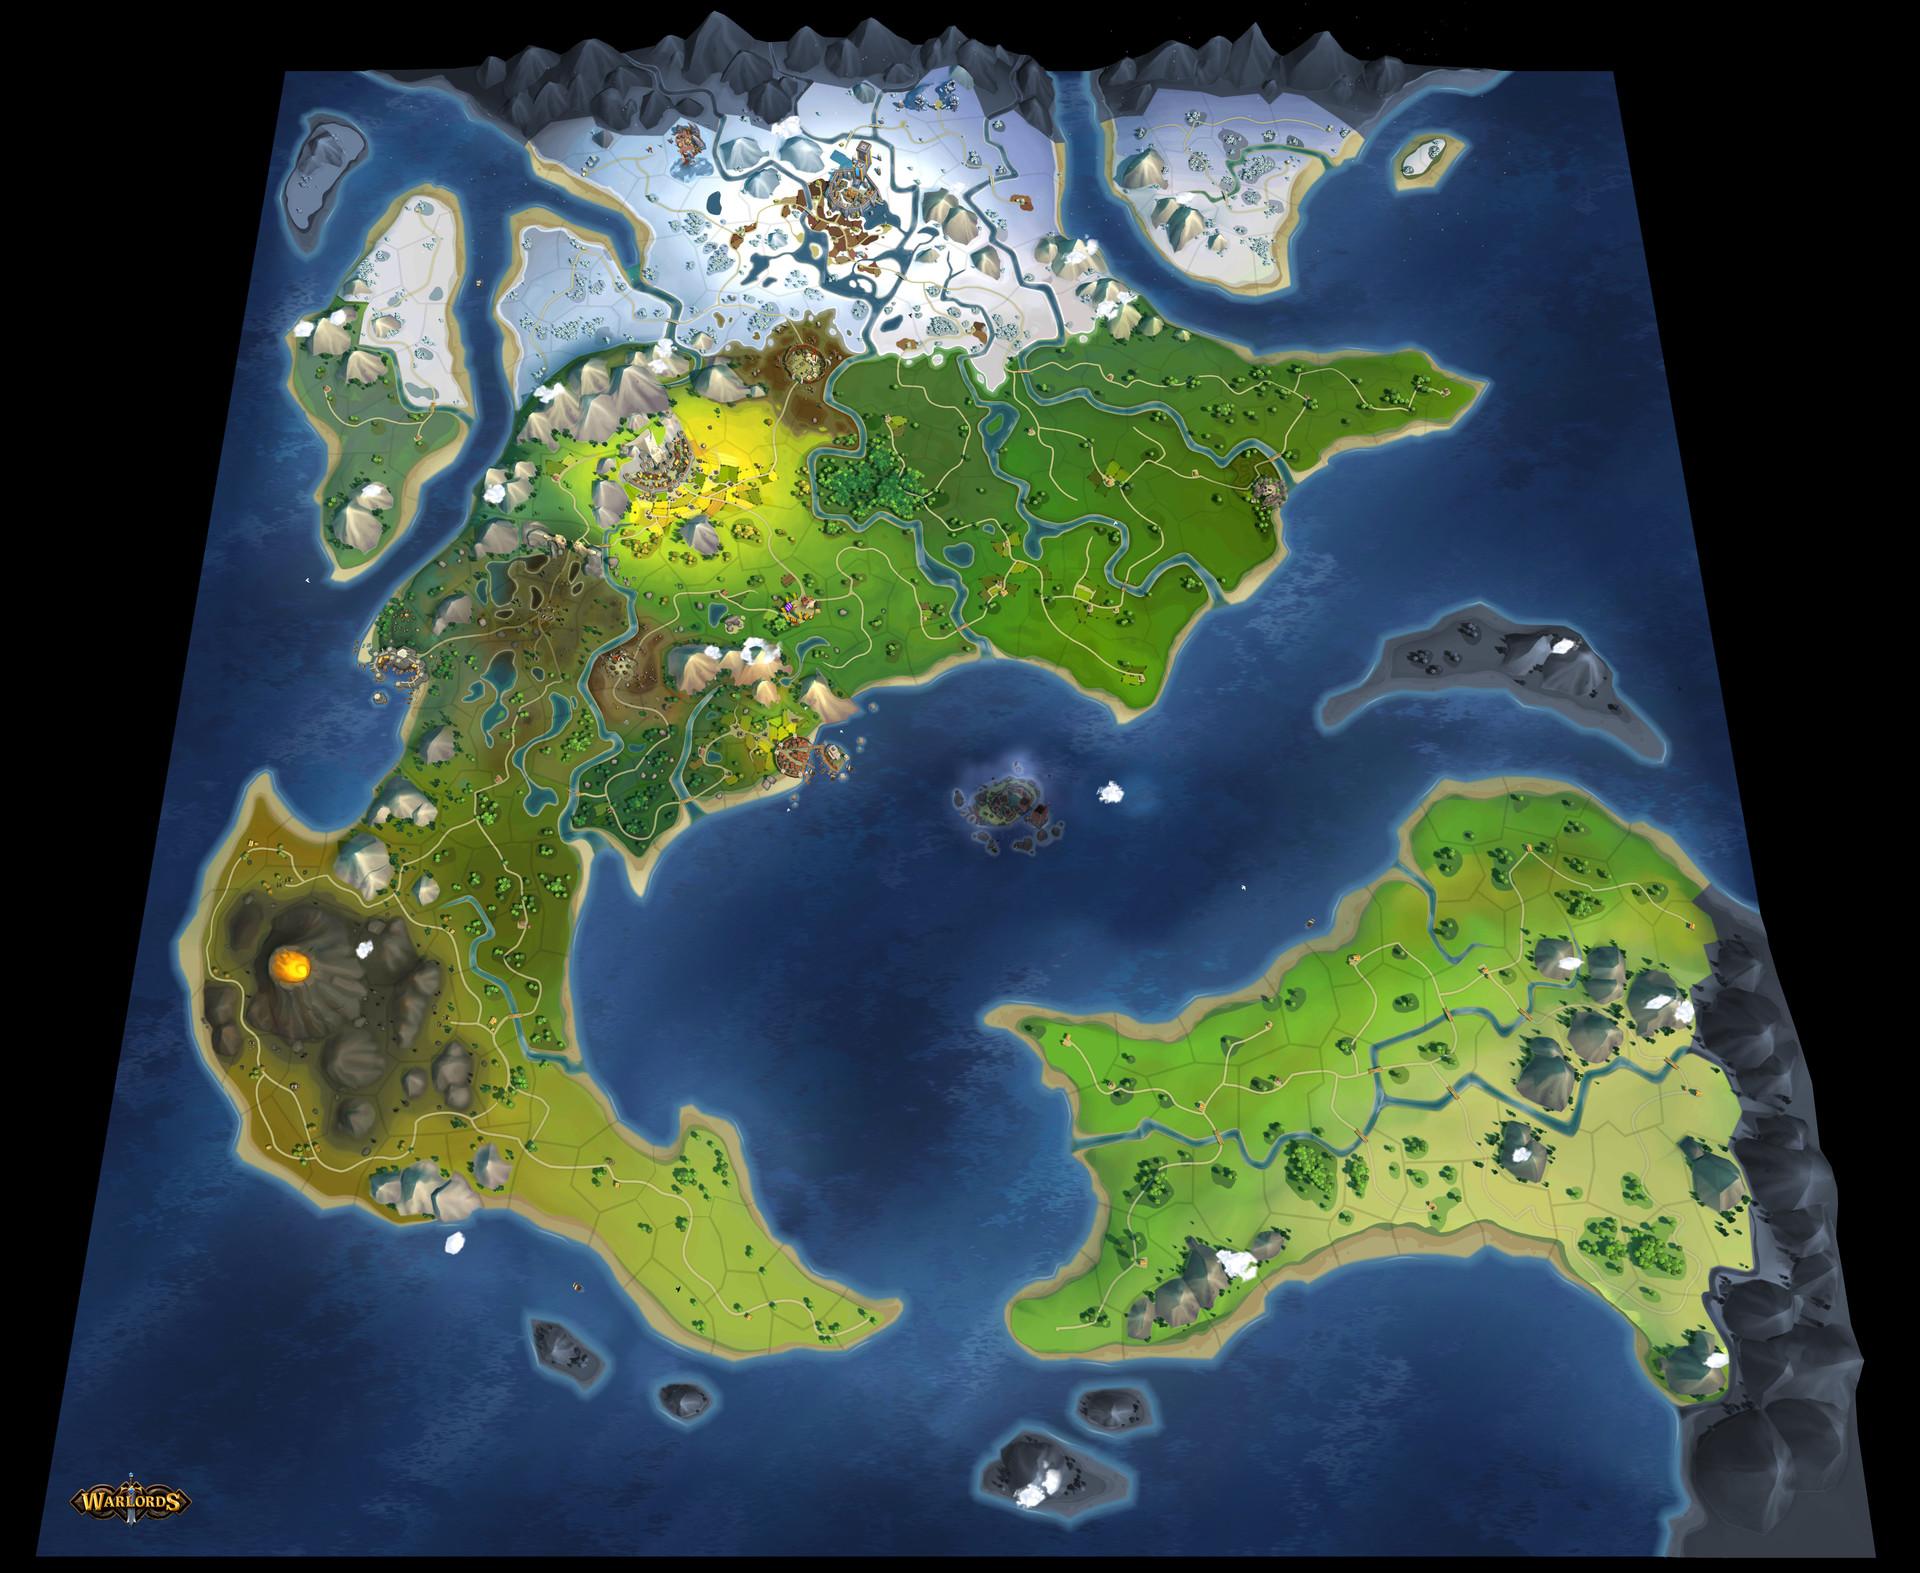 Artstation warlords world map christopher giese kettelacke full size gumiabroncs Gallery